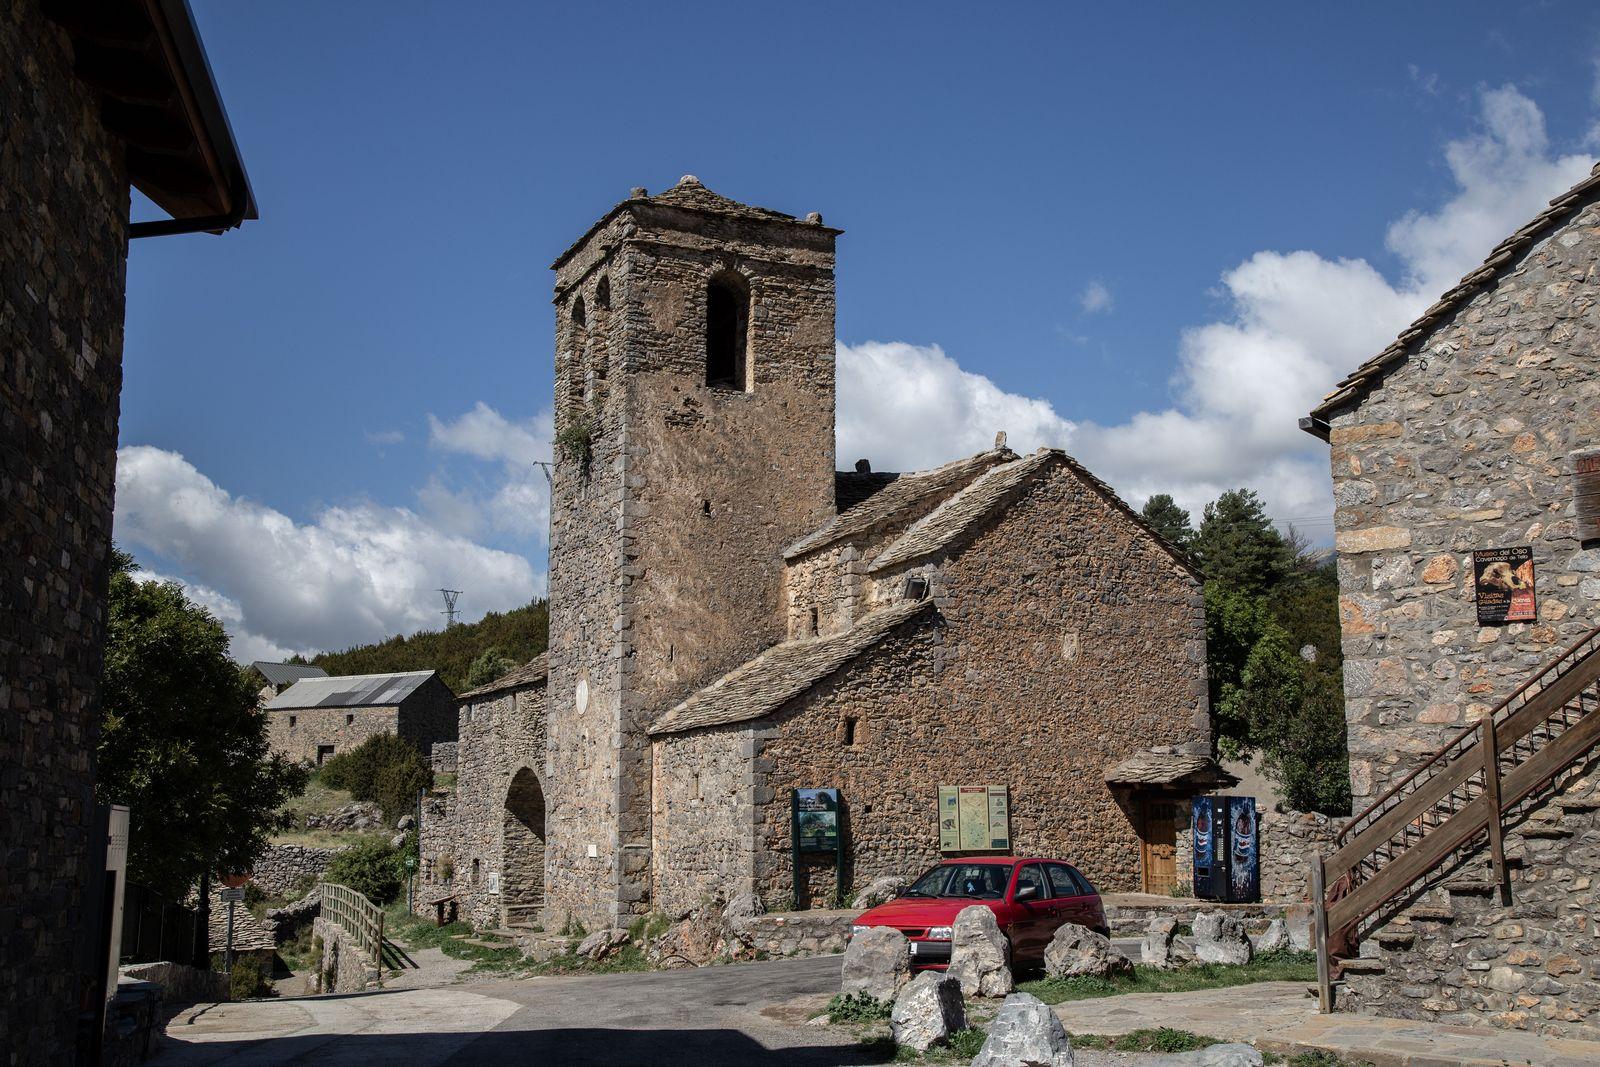 Antes de las ermitas, la Iglesia de San Martín